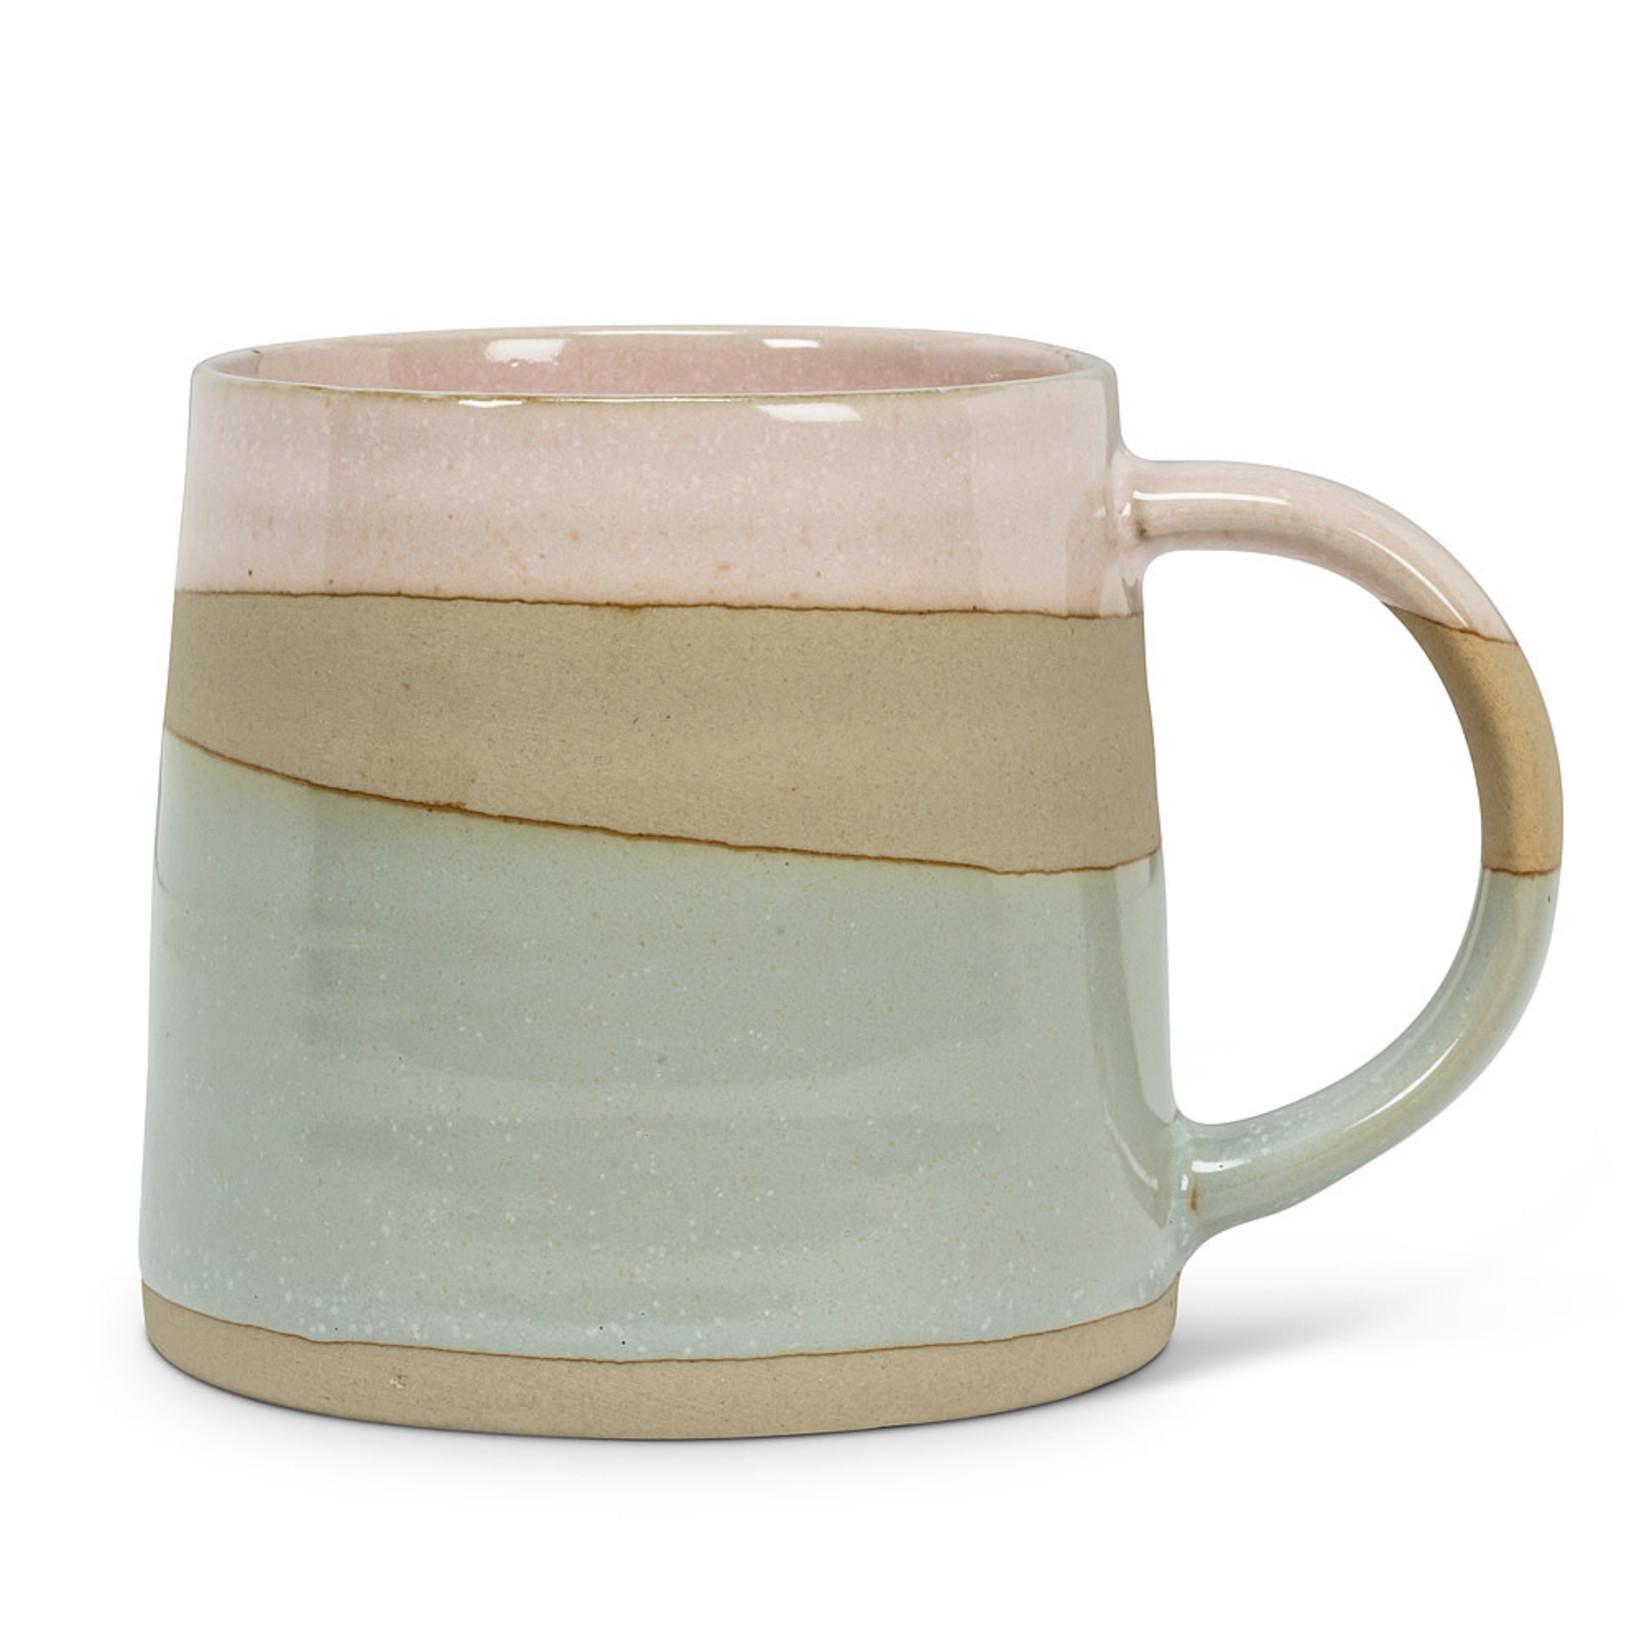 Pnk/Blu Rustic Style Mug (14oz.)